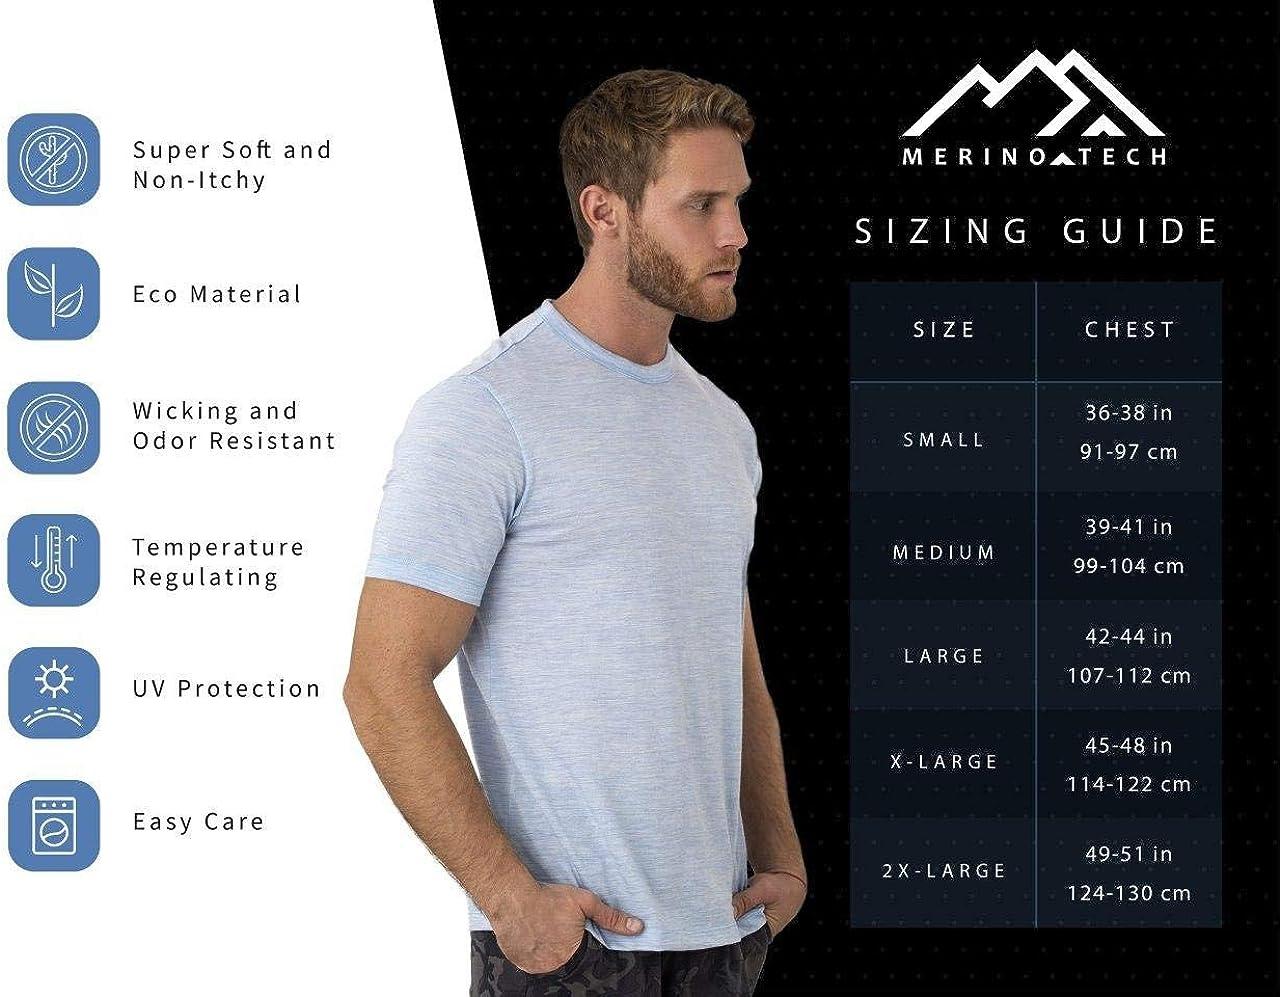 Merino.tech 100% Organic Merino Wool Lightweight Men's Base Layer Thermal T-Shirt + Hiking Wool Socks: Clothing